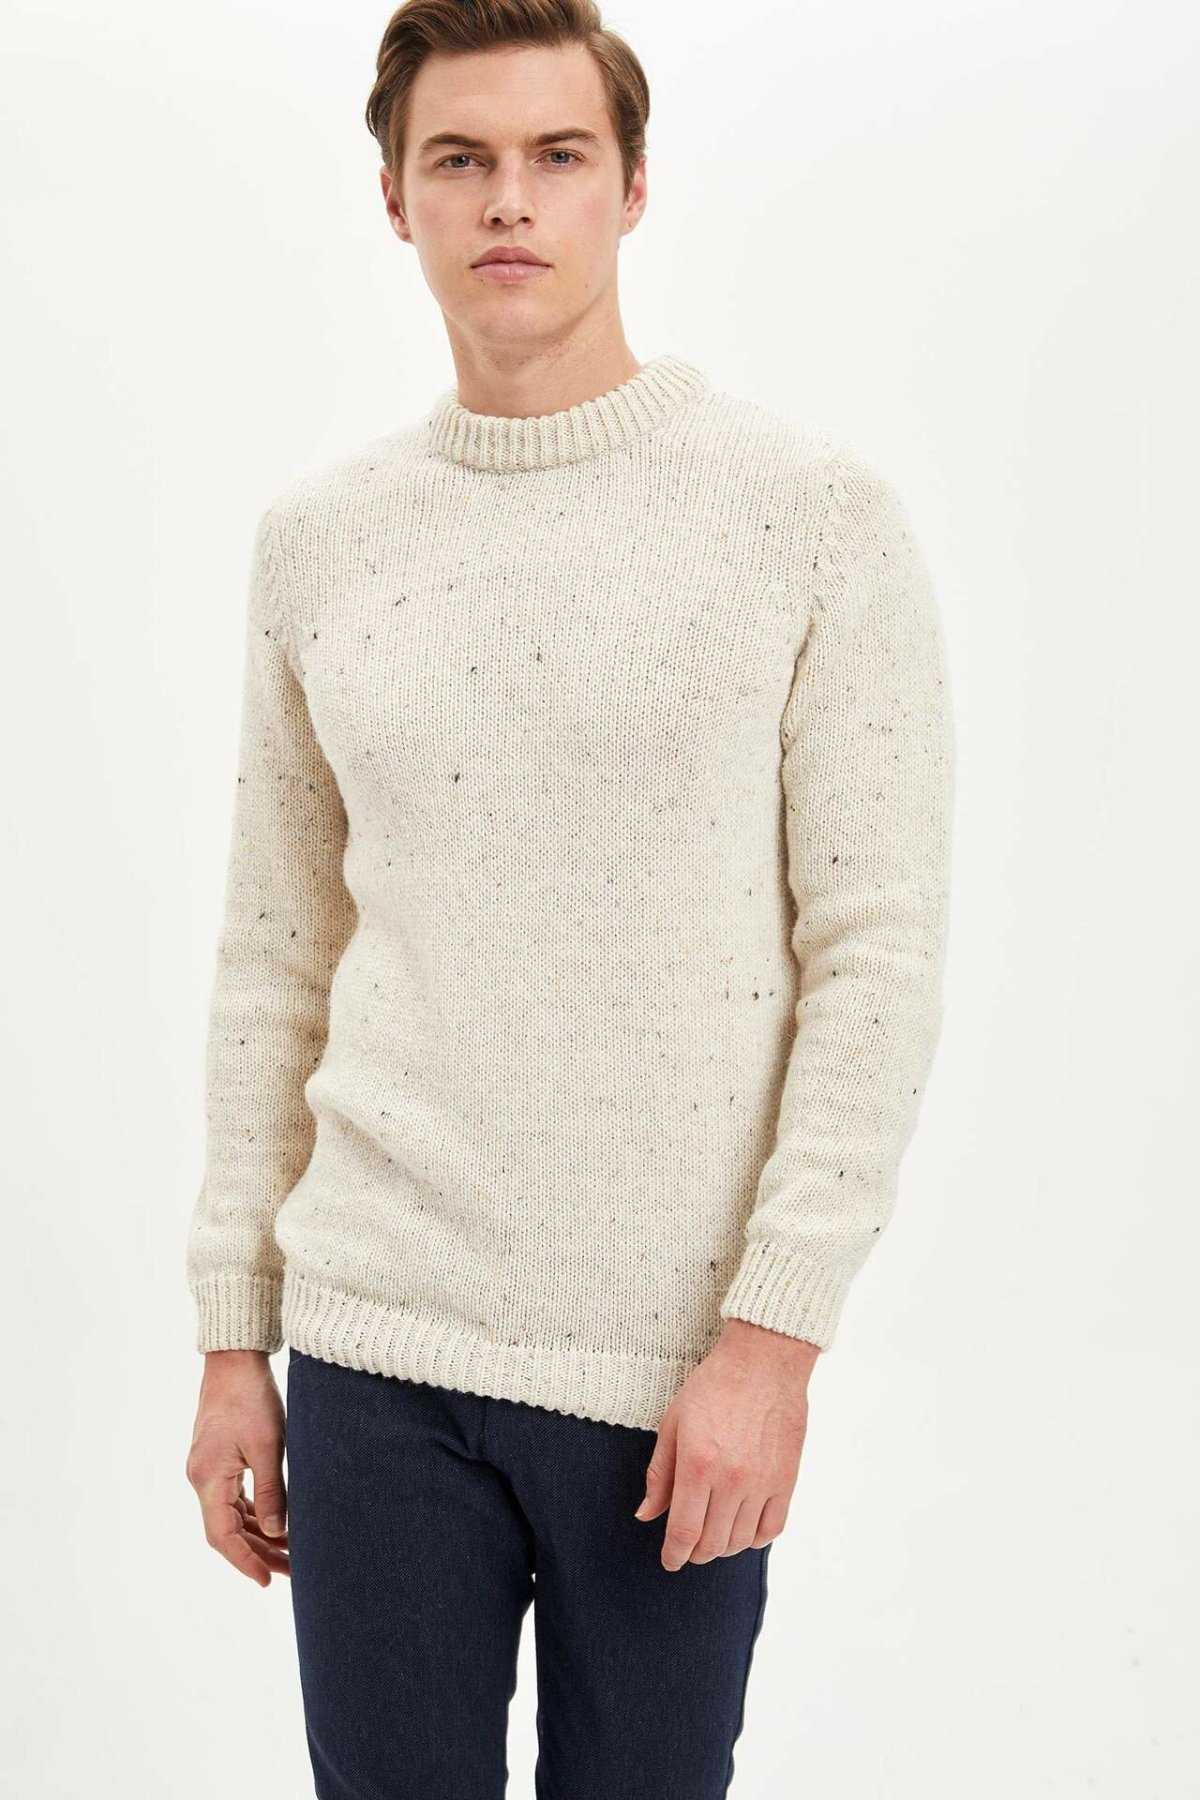 DeFacto Autumn Men O-neck Sweatshirt Male Fashion Pure Color Long Sleeve Tops Men's Casual Comfort Pullover - M0201AZ19WN